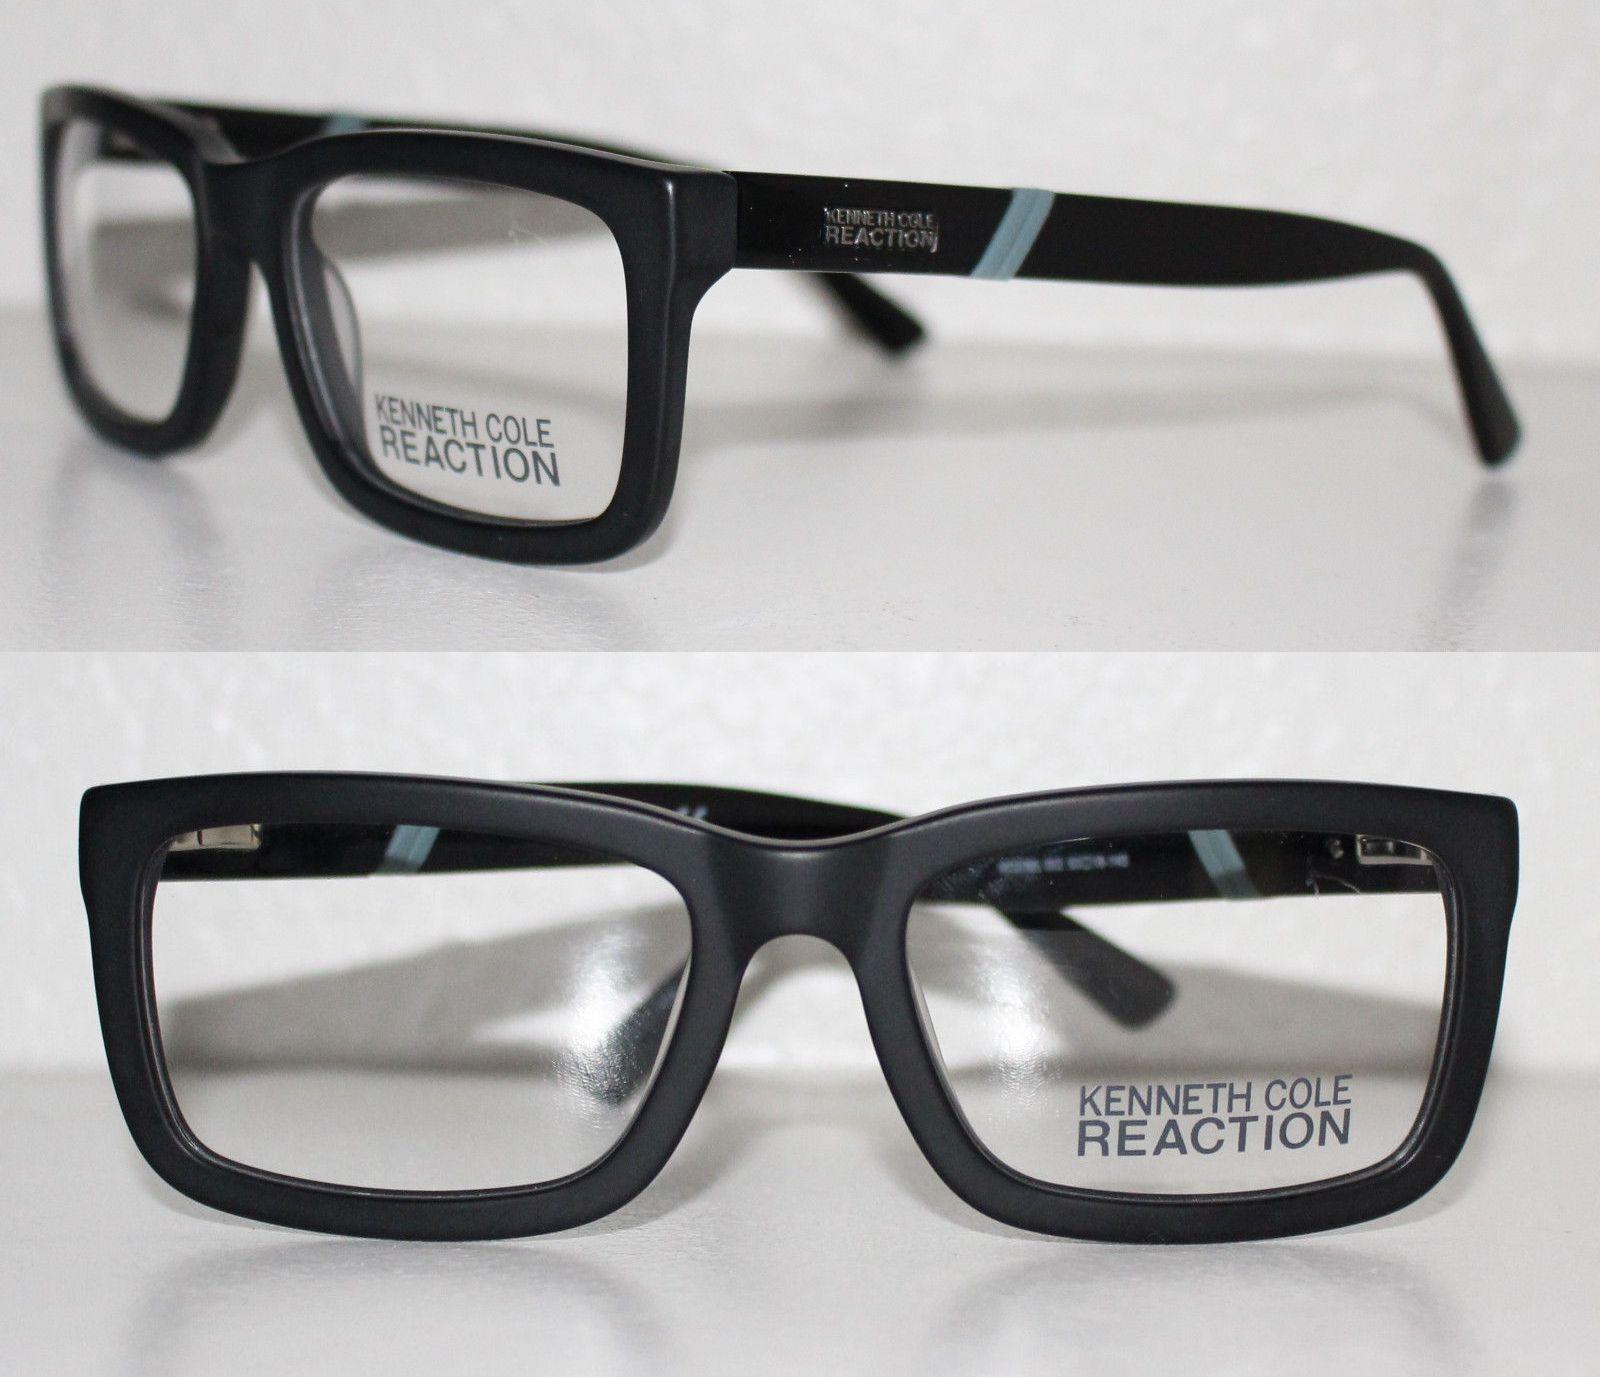 8bb2857e9d2 Vision Care 31414  Kenneth Cole Reaction Kc0785 002 Matte Black New Optical  Eyeglass Frame For